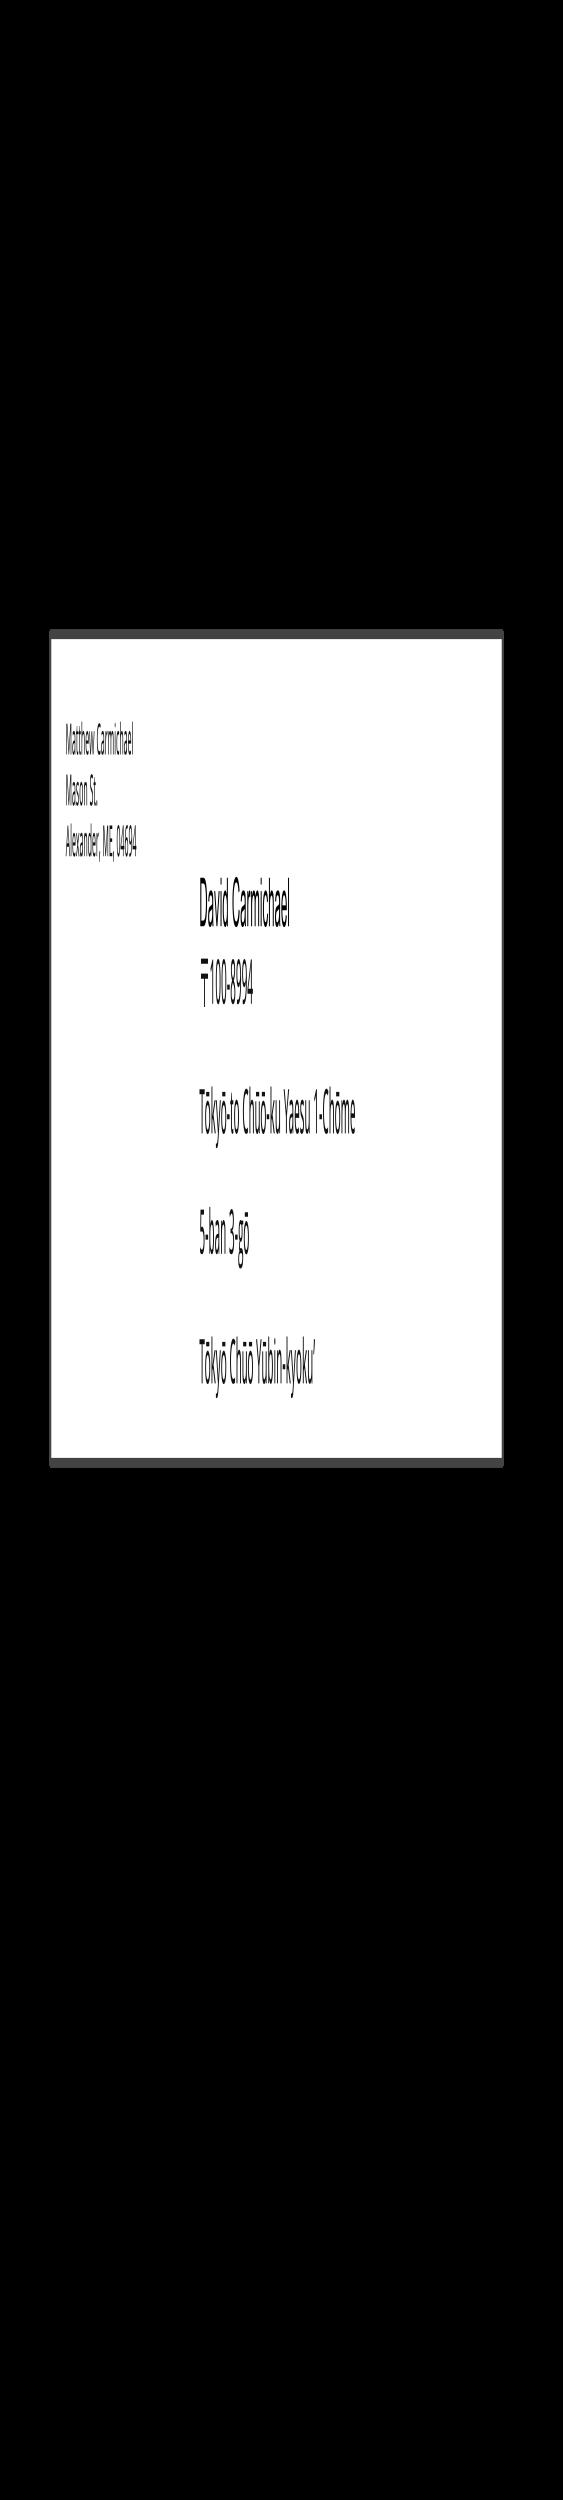 image?w=563&h=206&rev=130&ac=1